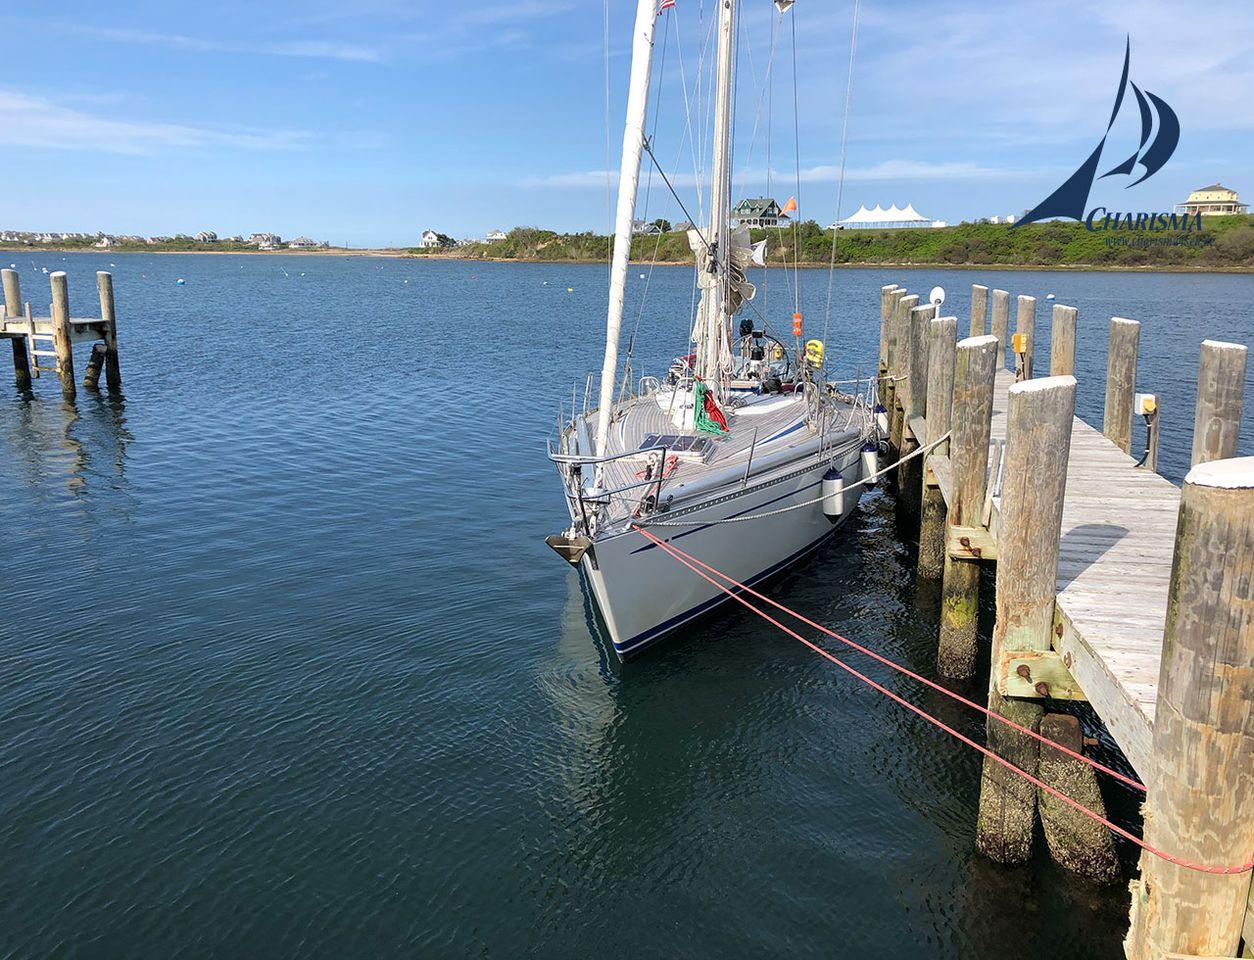 SY CHARISMA auf Block Island